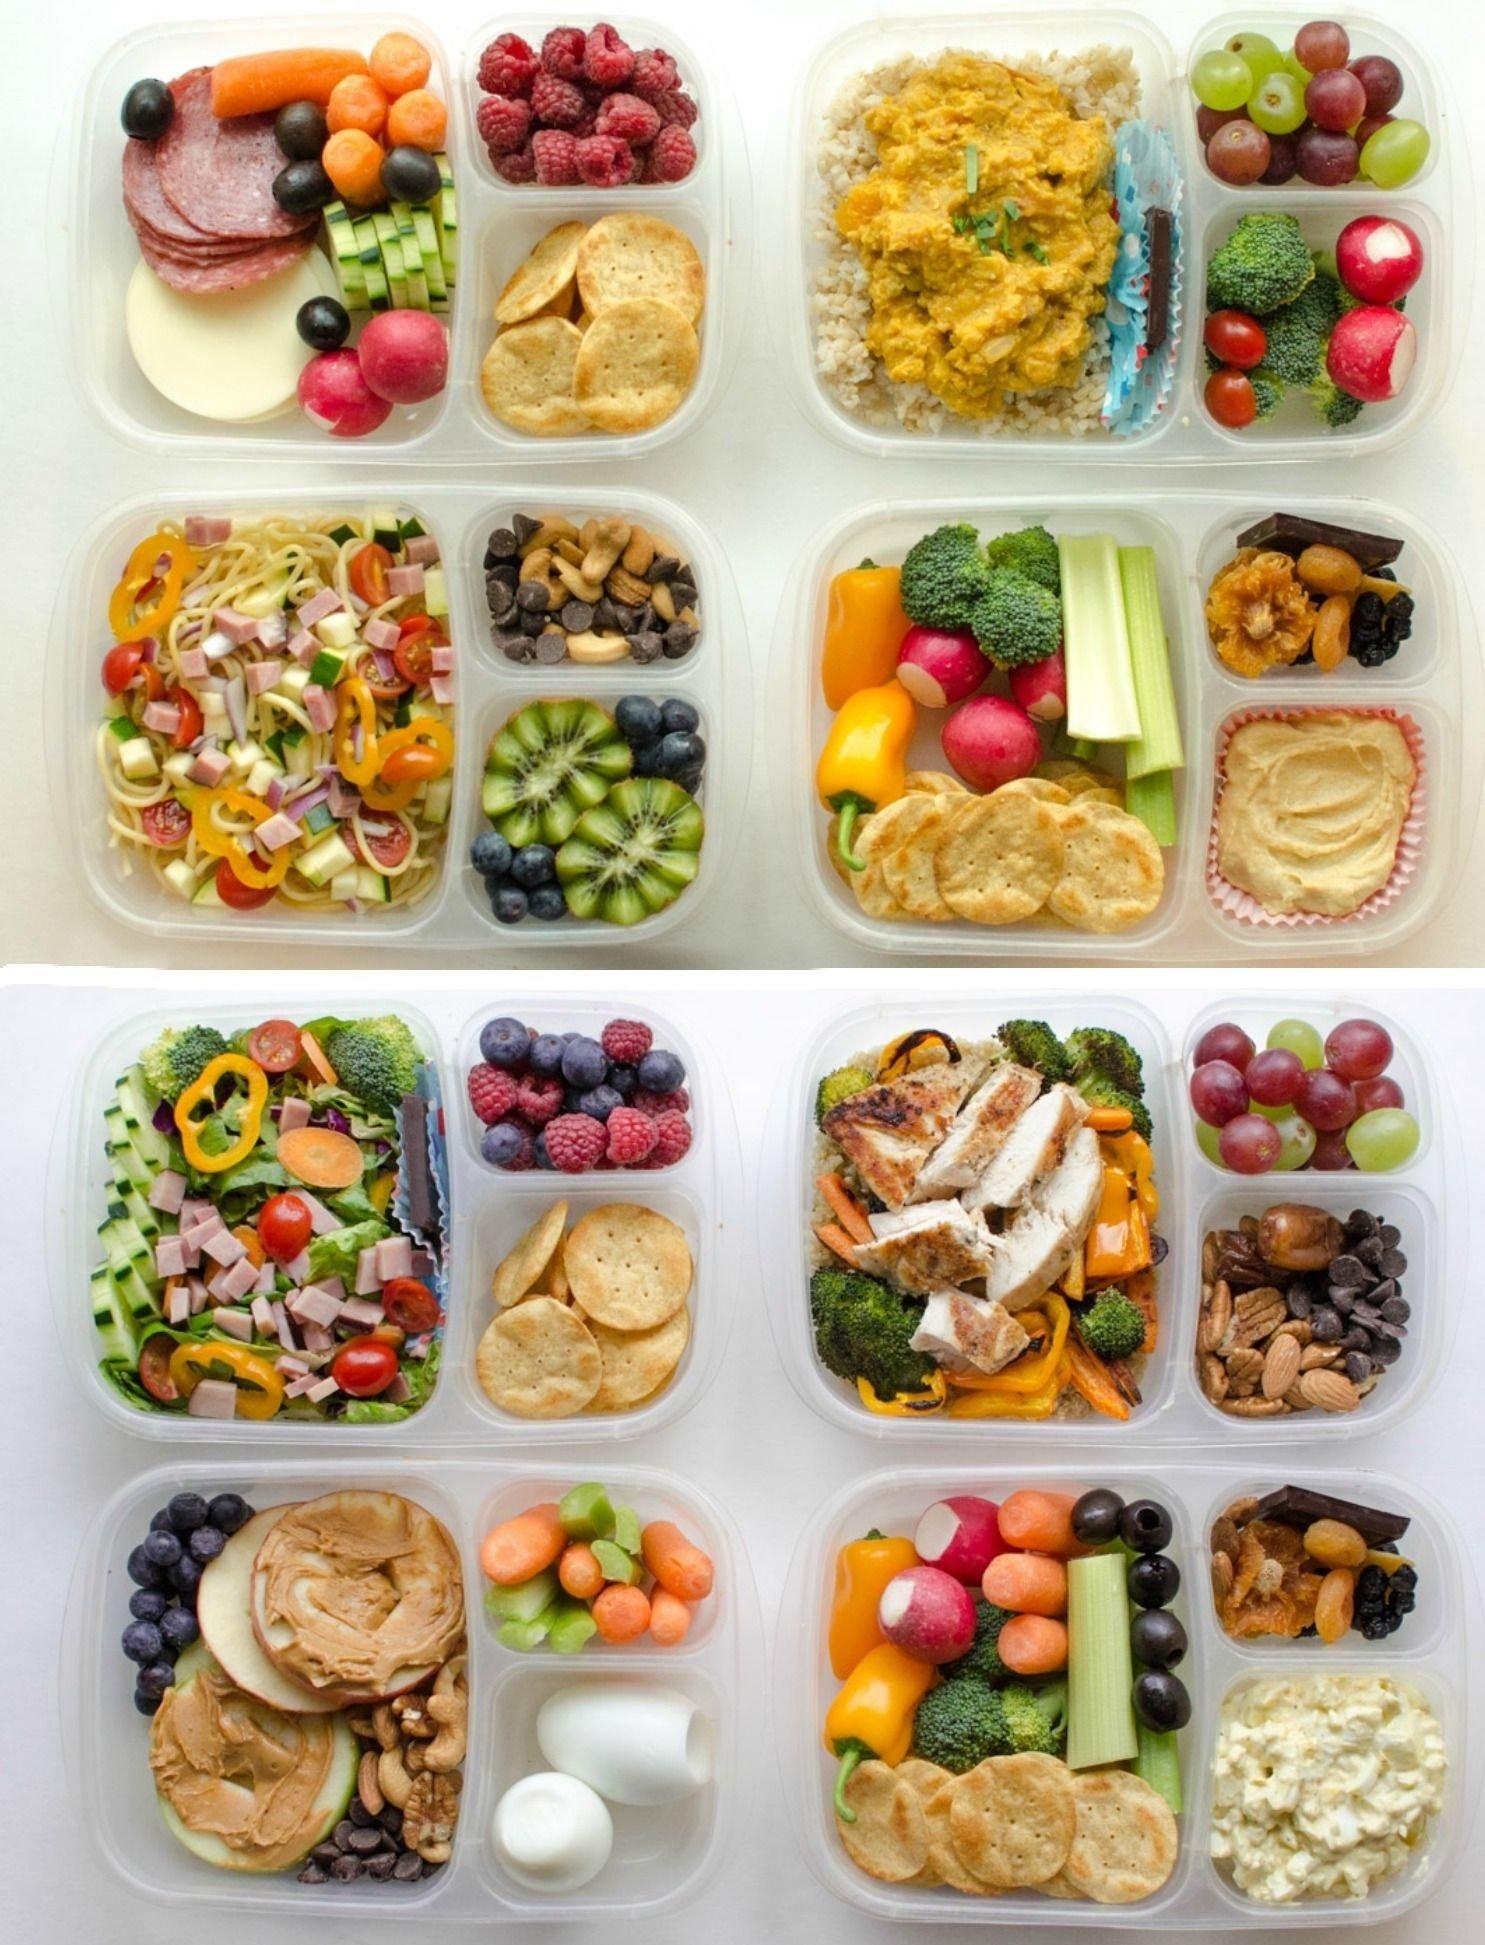 10 Fashionable Bento Box Ideas For Kids 8 adult lunch box ideas lunch box ideas lunch box and lunches 7 2020